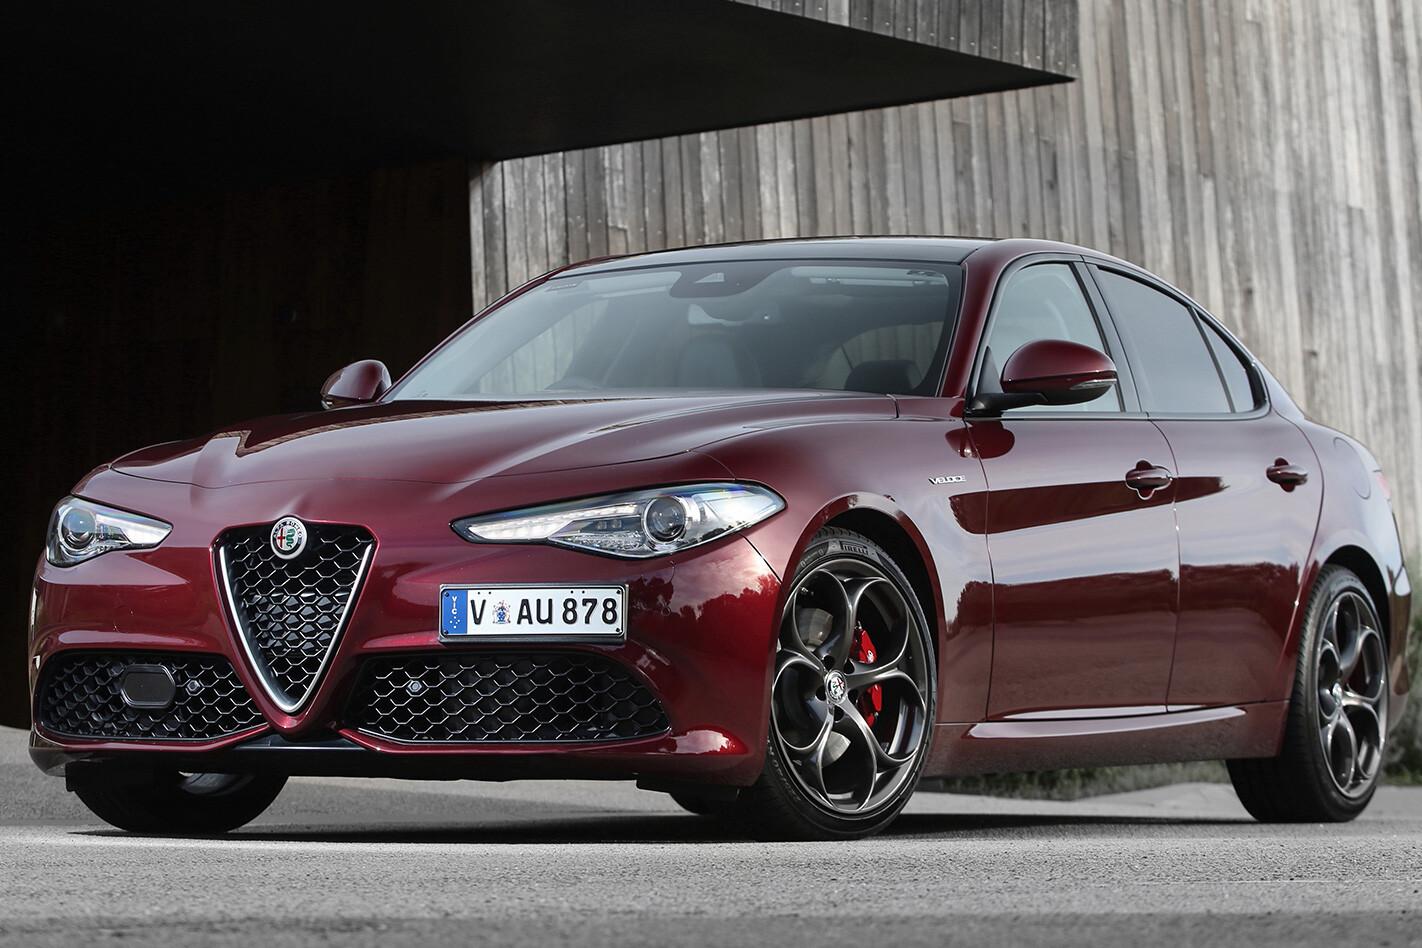 2017 Alfa Romeo Giulia Veloce front facing